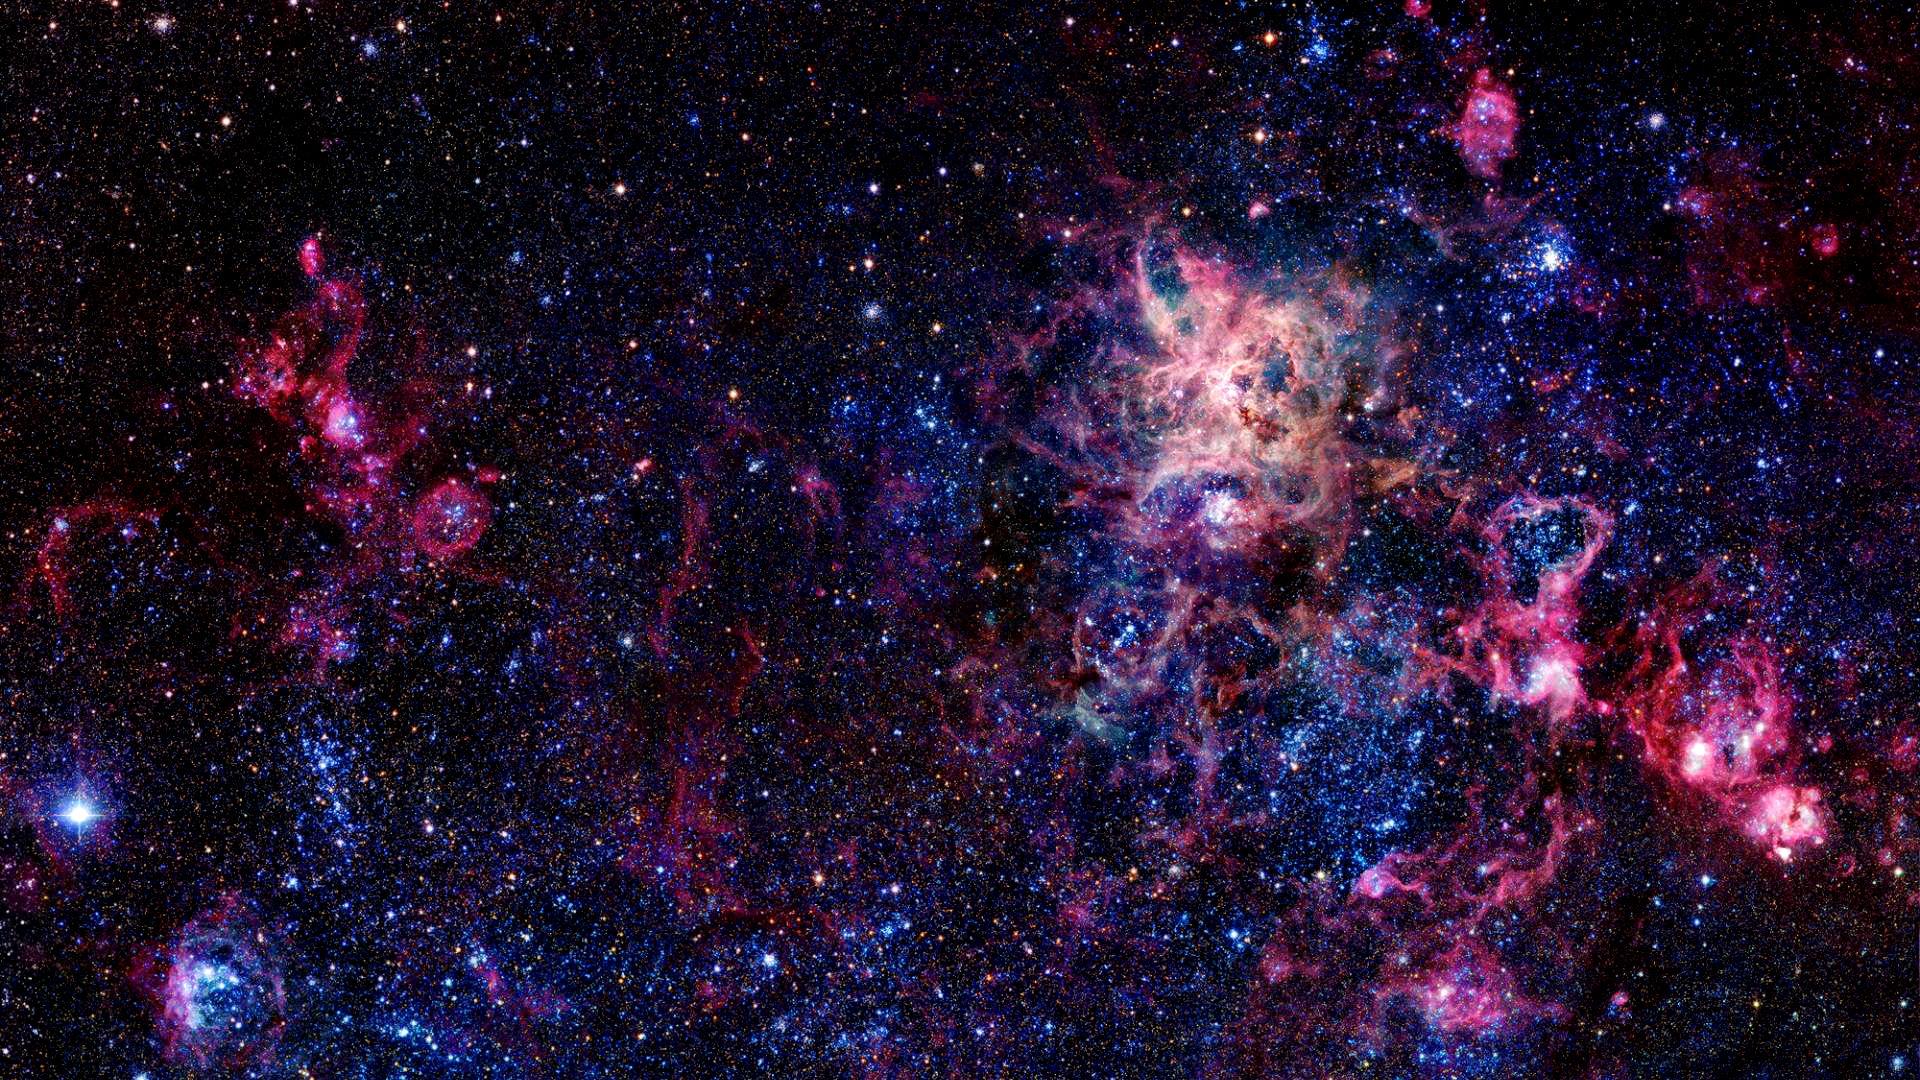 Colorful nebula wallpaper Wallpaper Wide HD 1920x1080